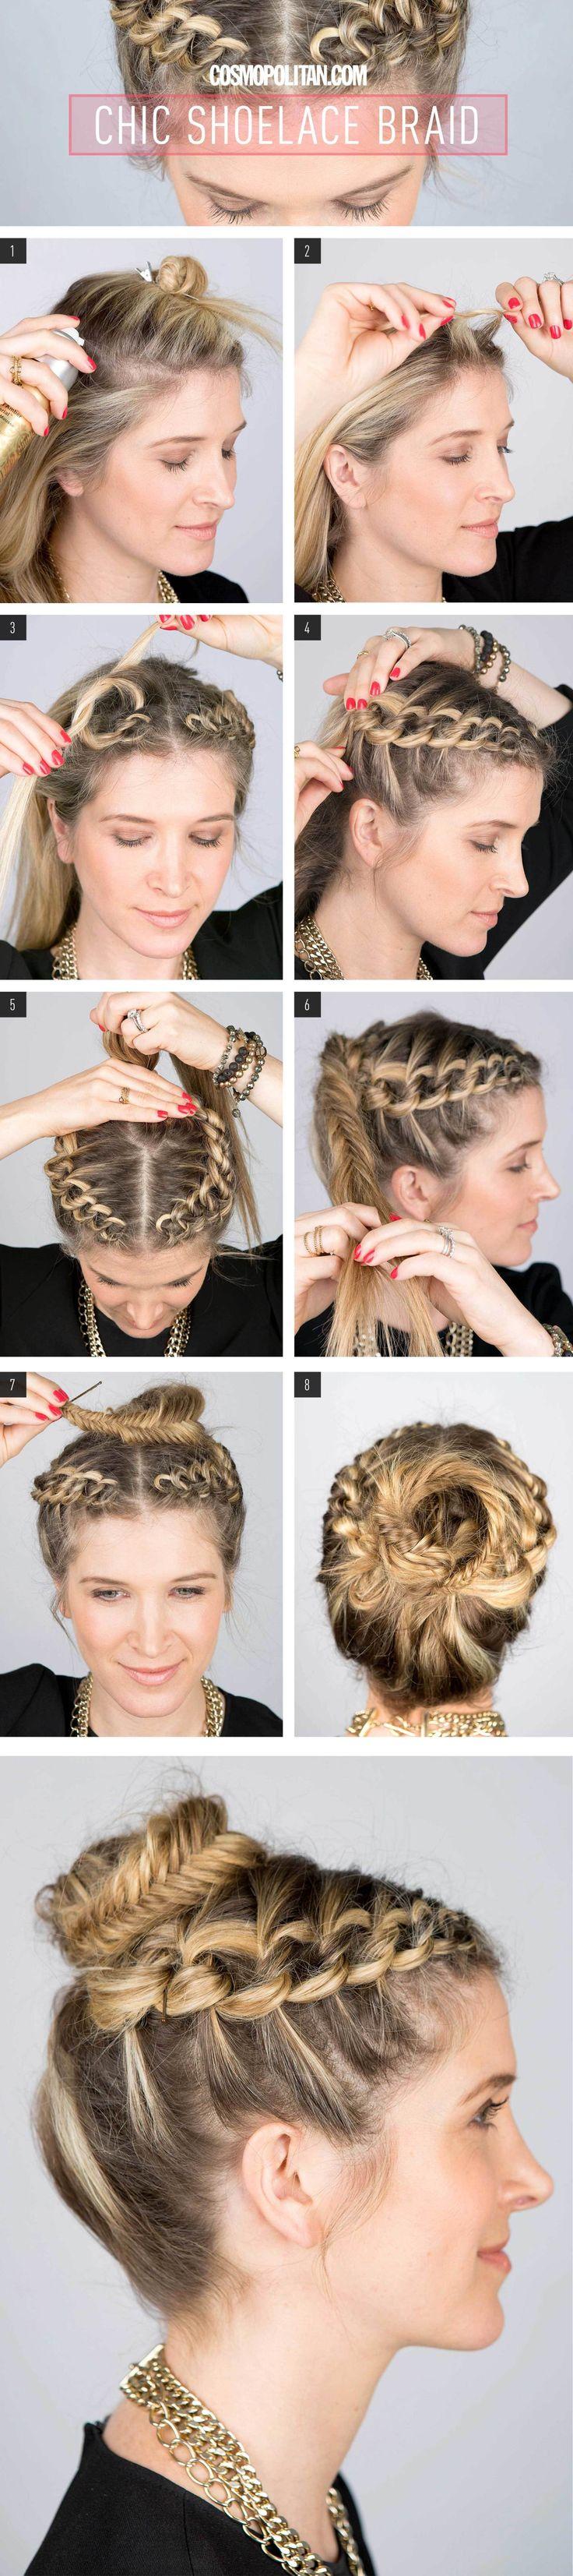 Hair How-To: Chic Shoelace Braid -Cosmopolitan.com